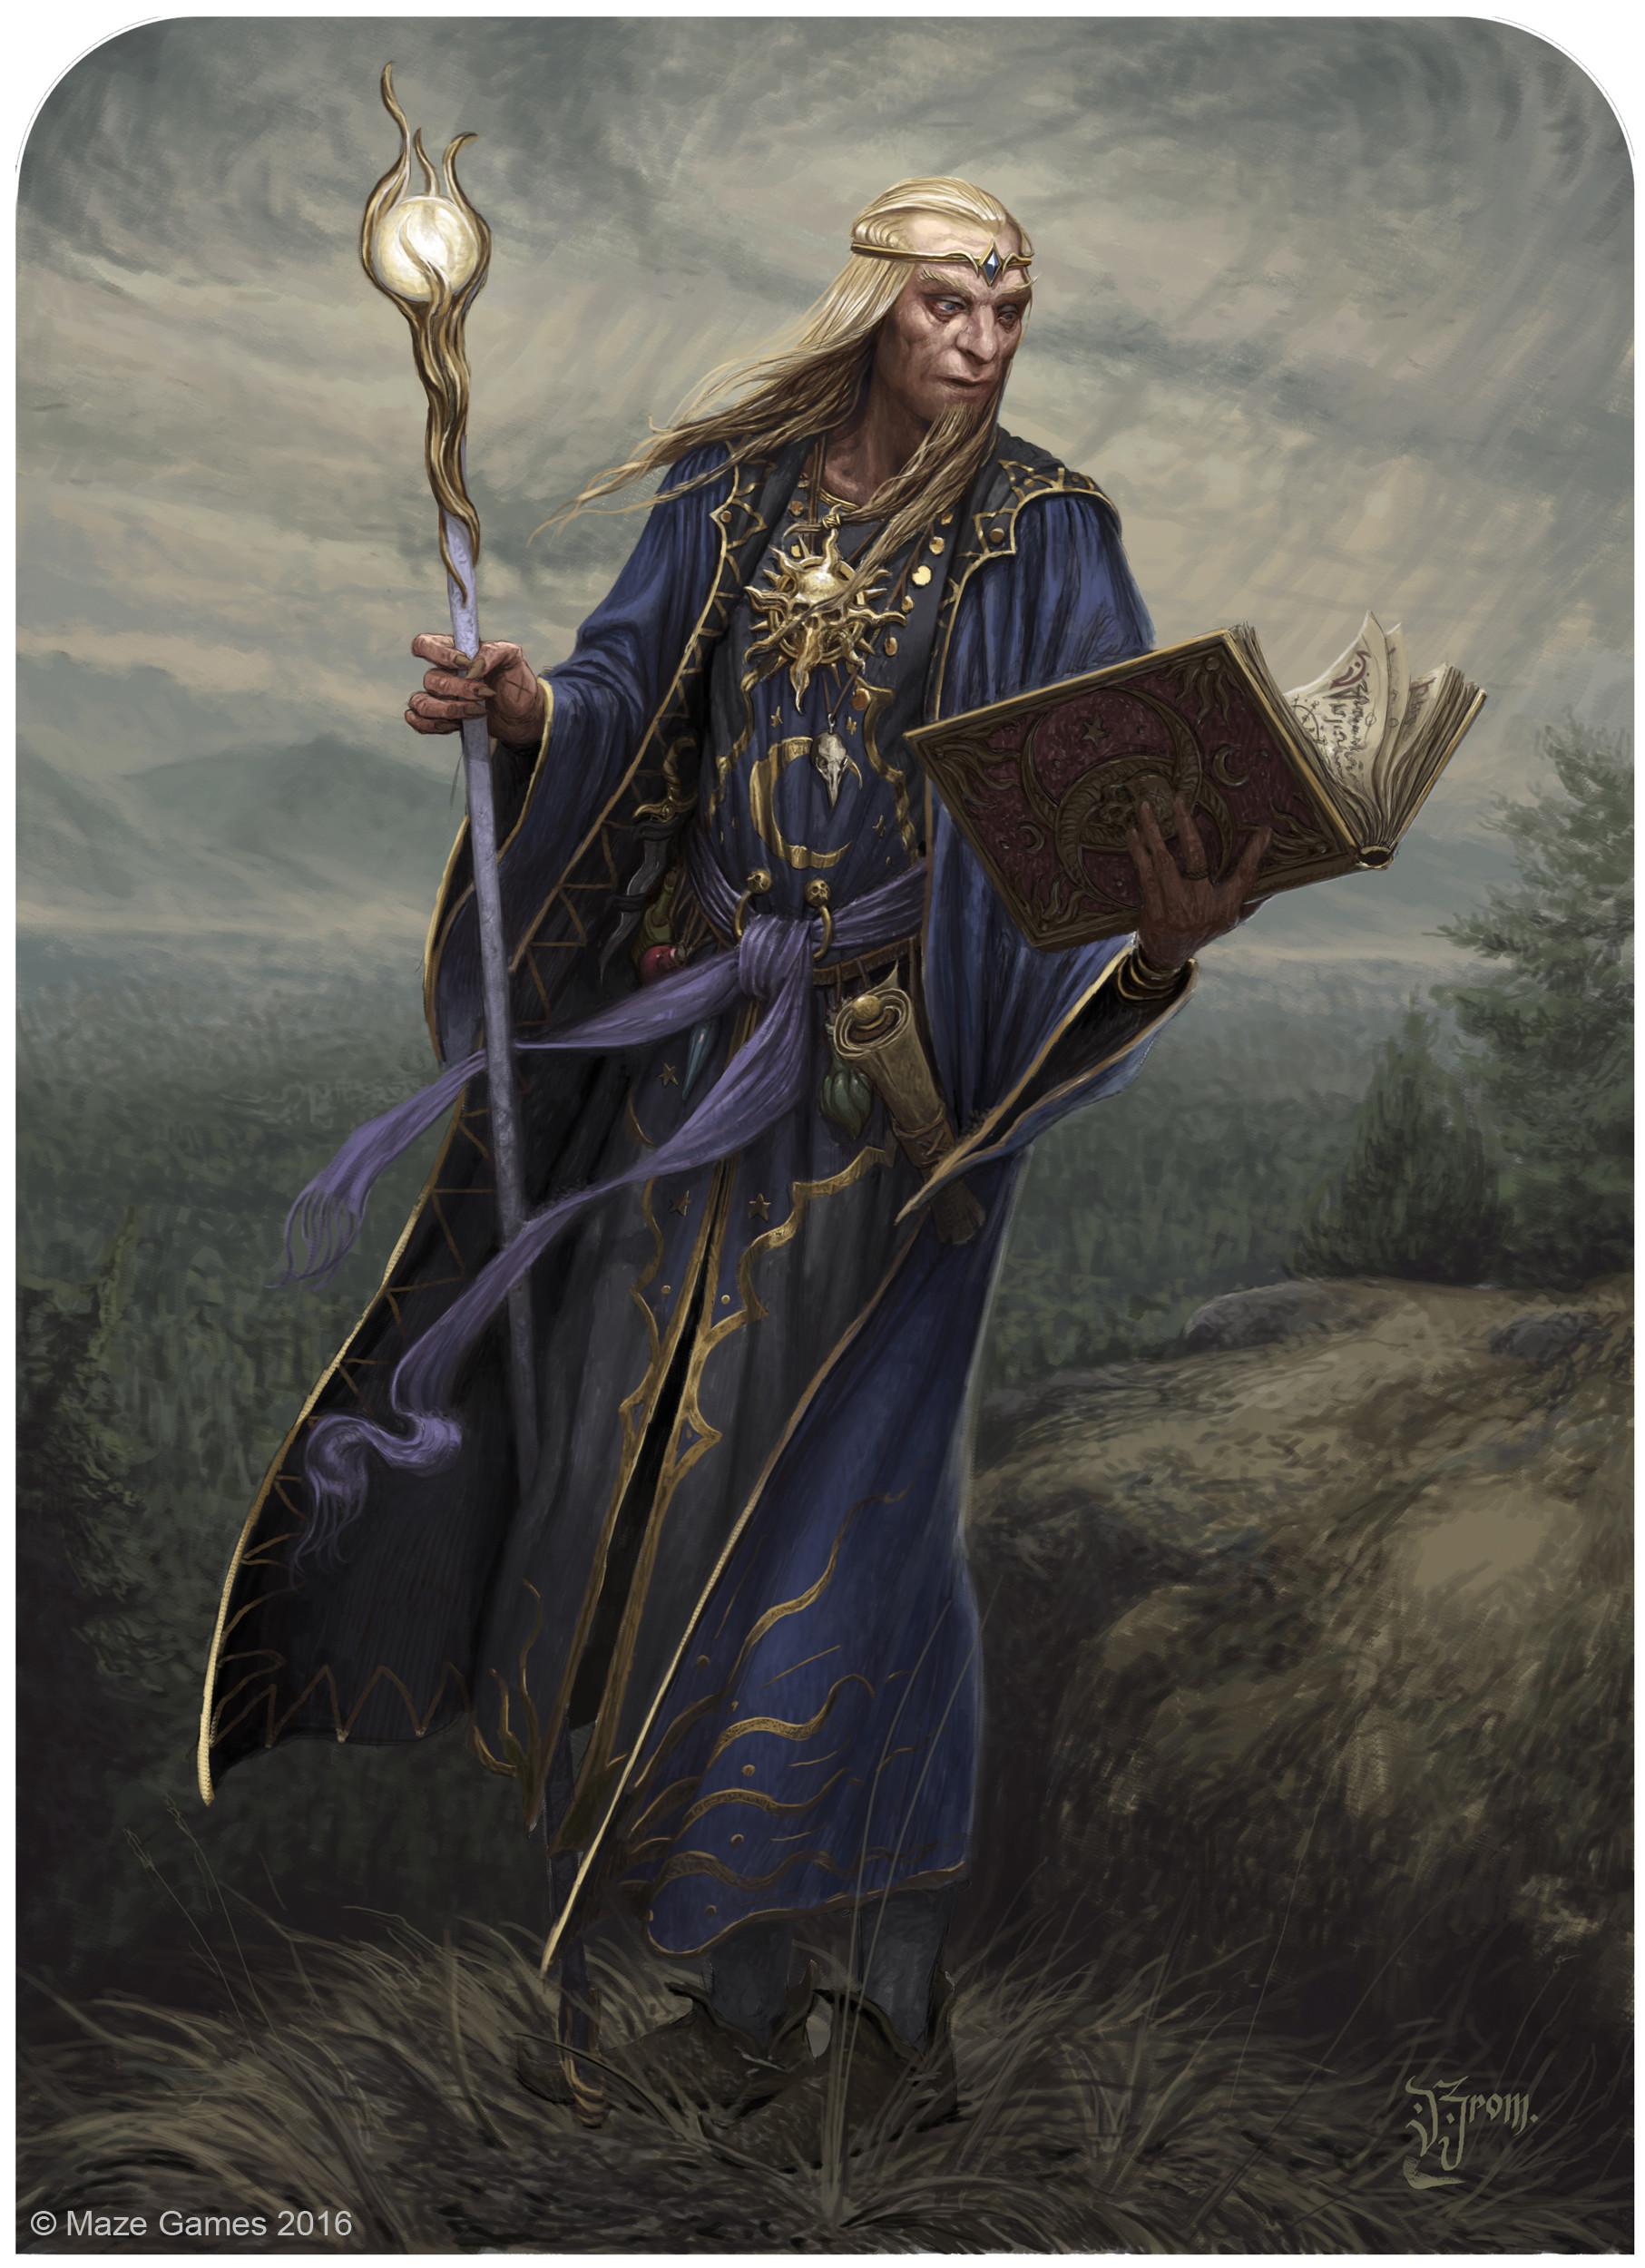 Daniel zrom danielzrom orcquest enchanteur bg